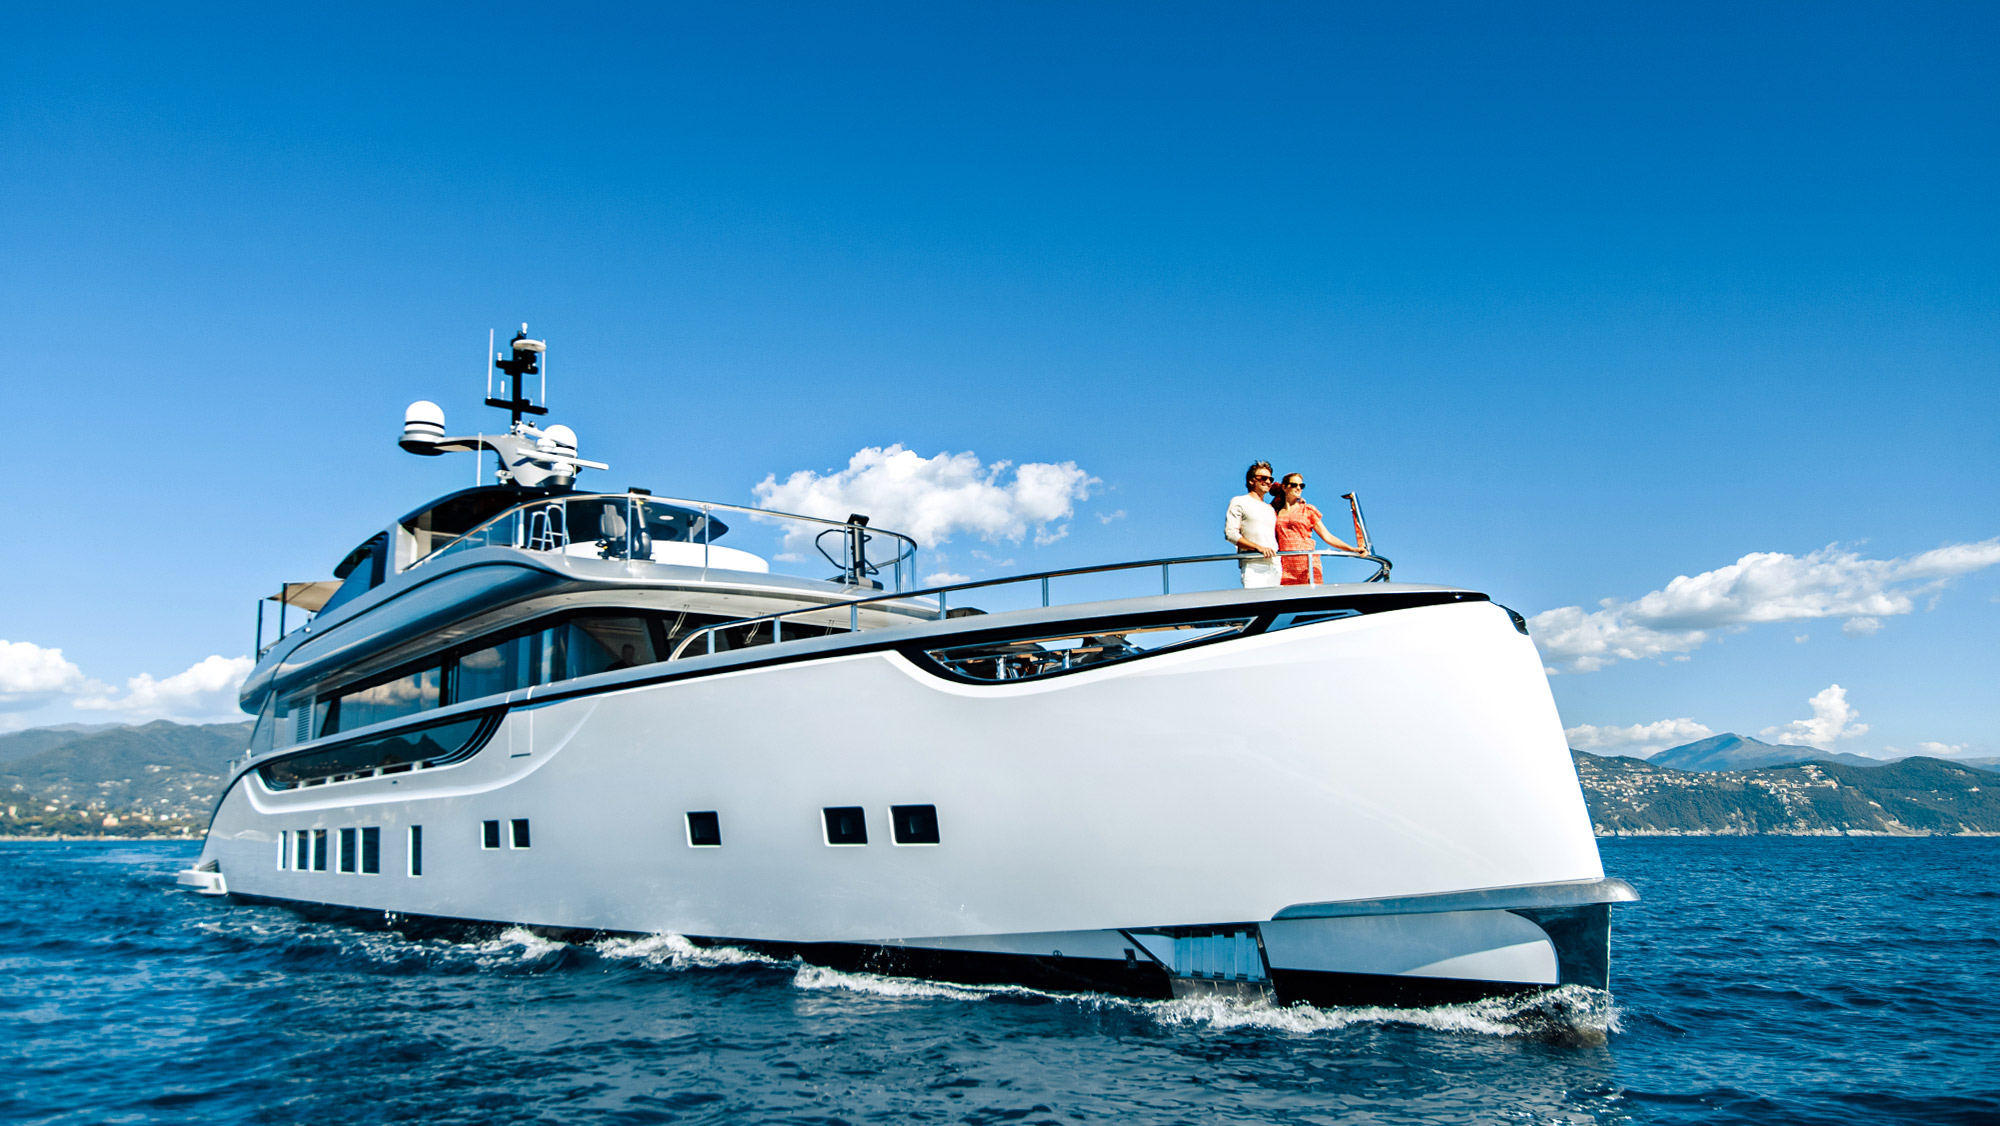 Dynamiq Jetsetter yacht cruising in Italy